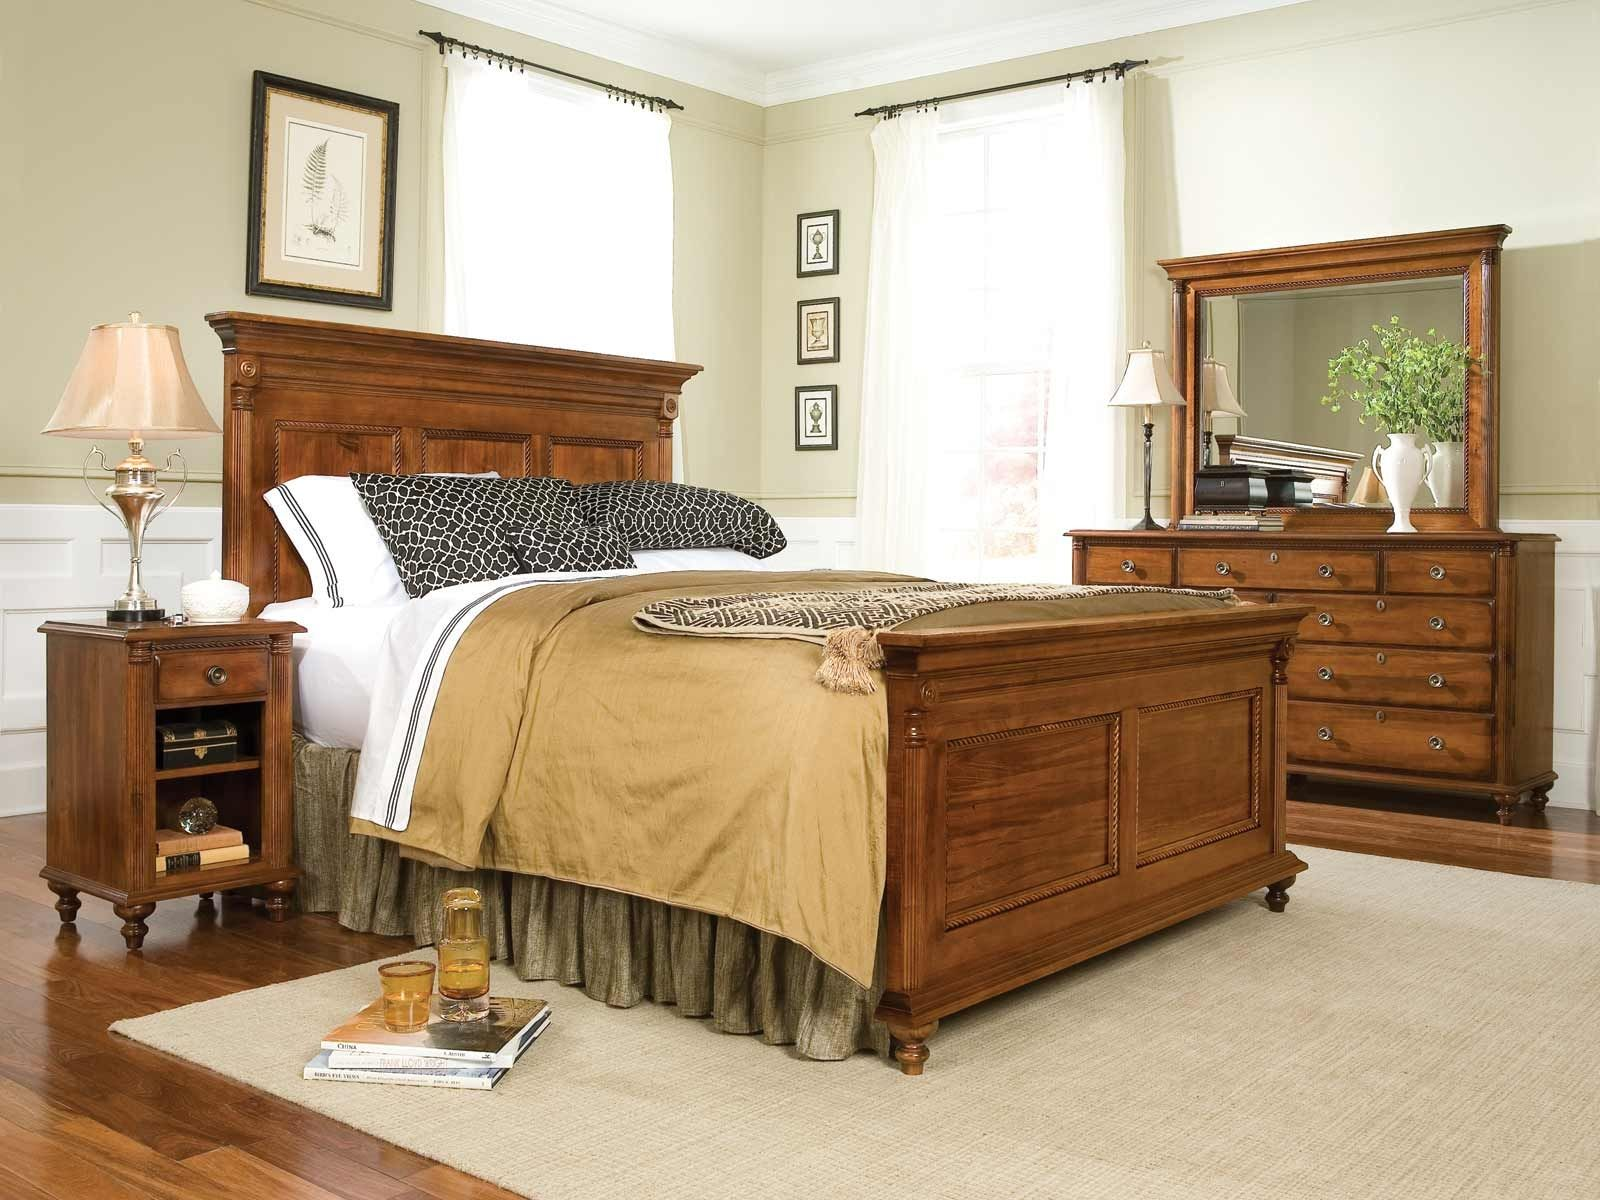 Bedroom Sets Furniture Row | Bedroom Sets | Pinterest | Bedrooms